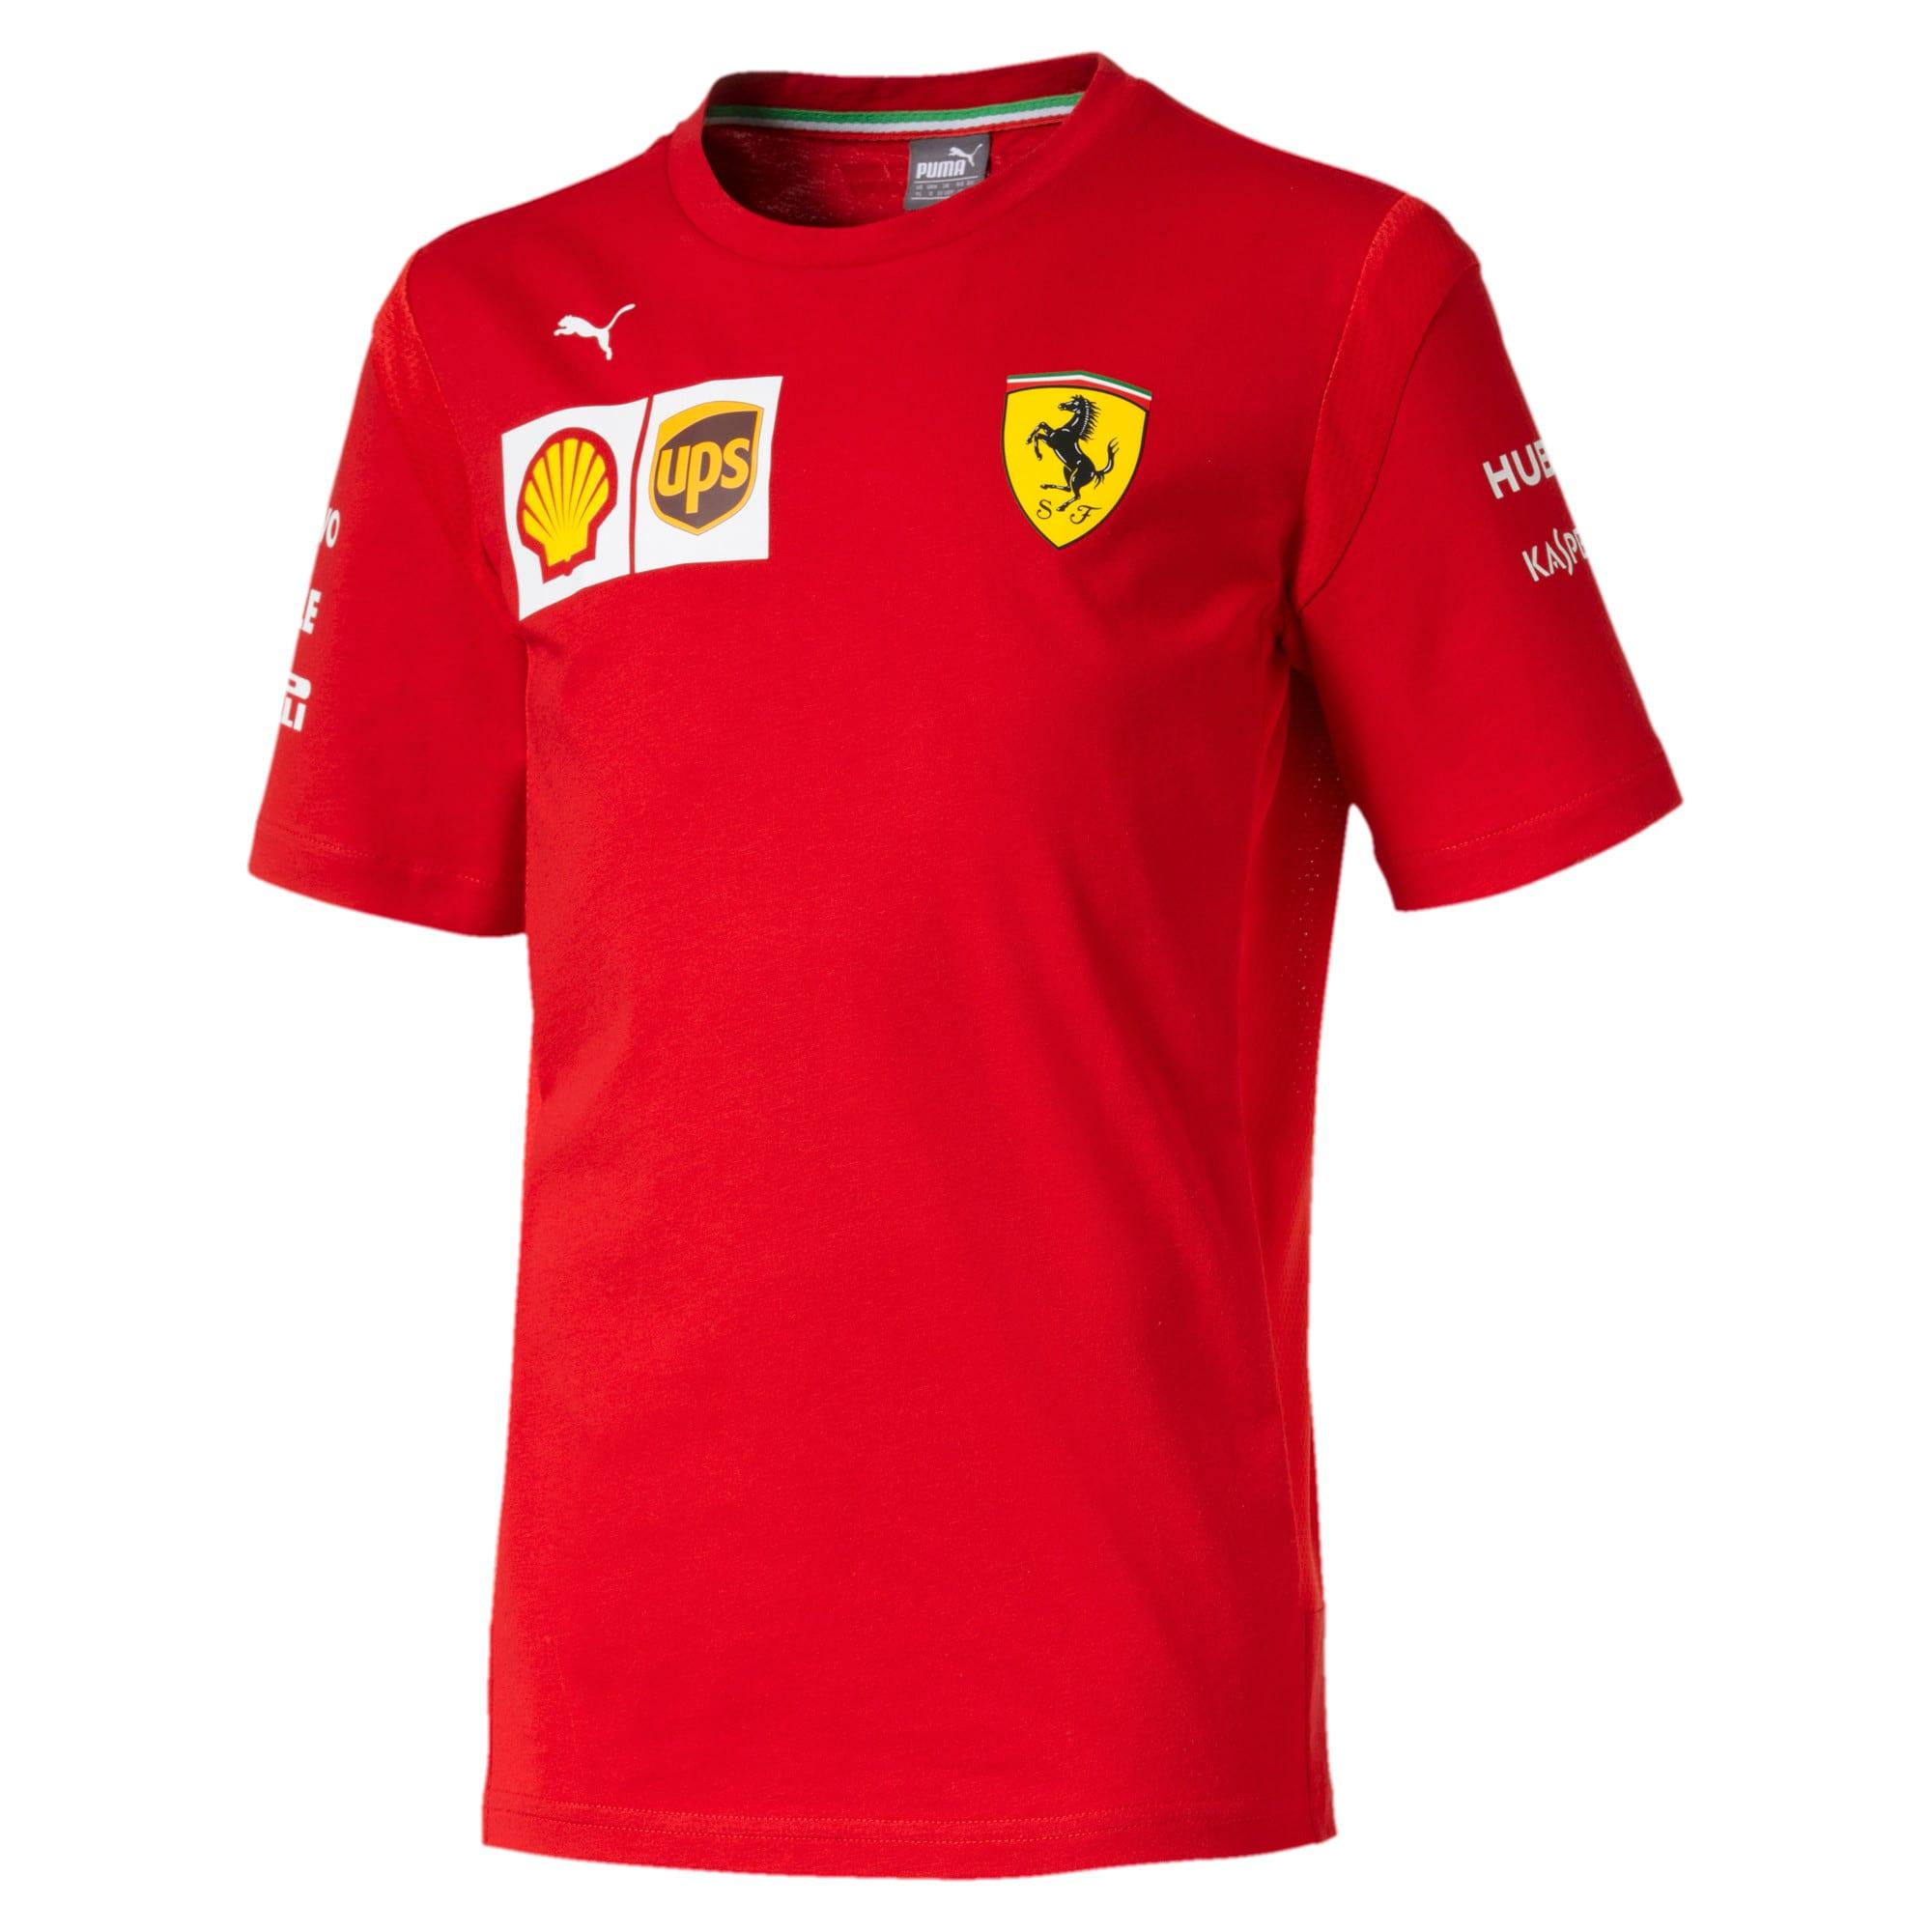 Thumbnail 1 of Scuderia Ferrari Boys' Team Tee JR, Rosso Corsa, medium